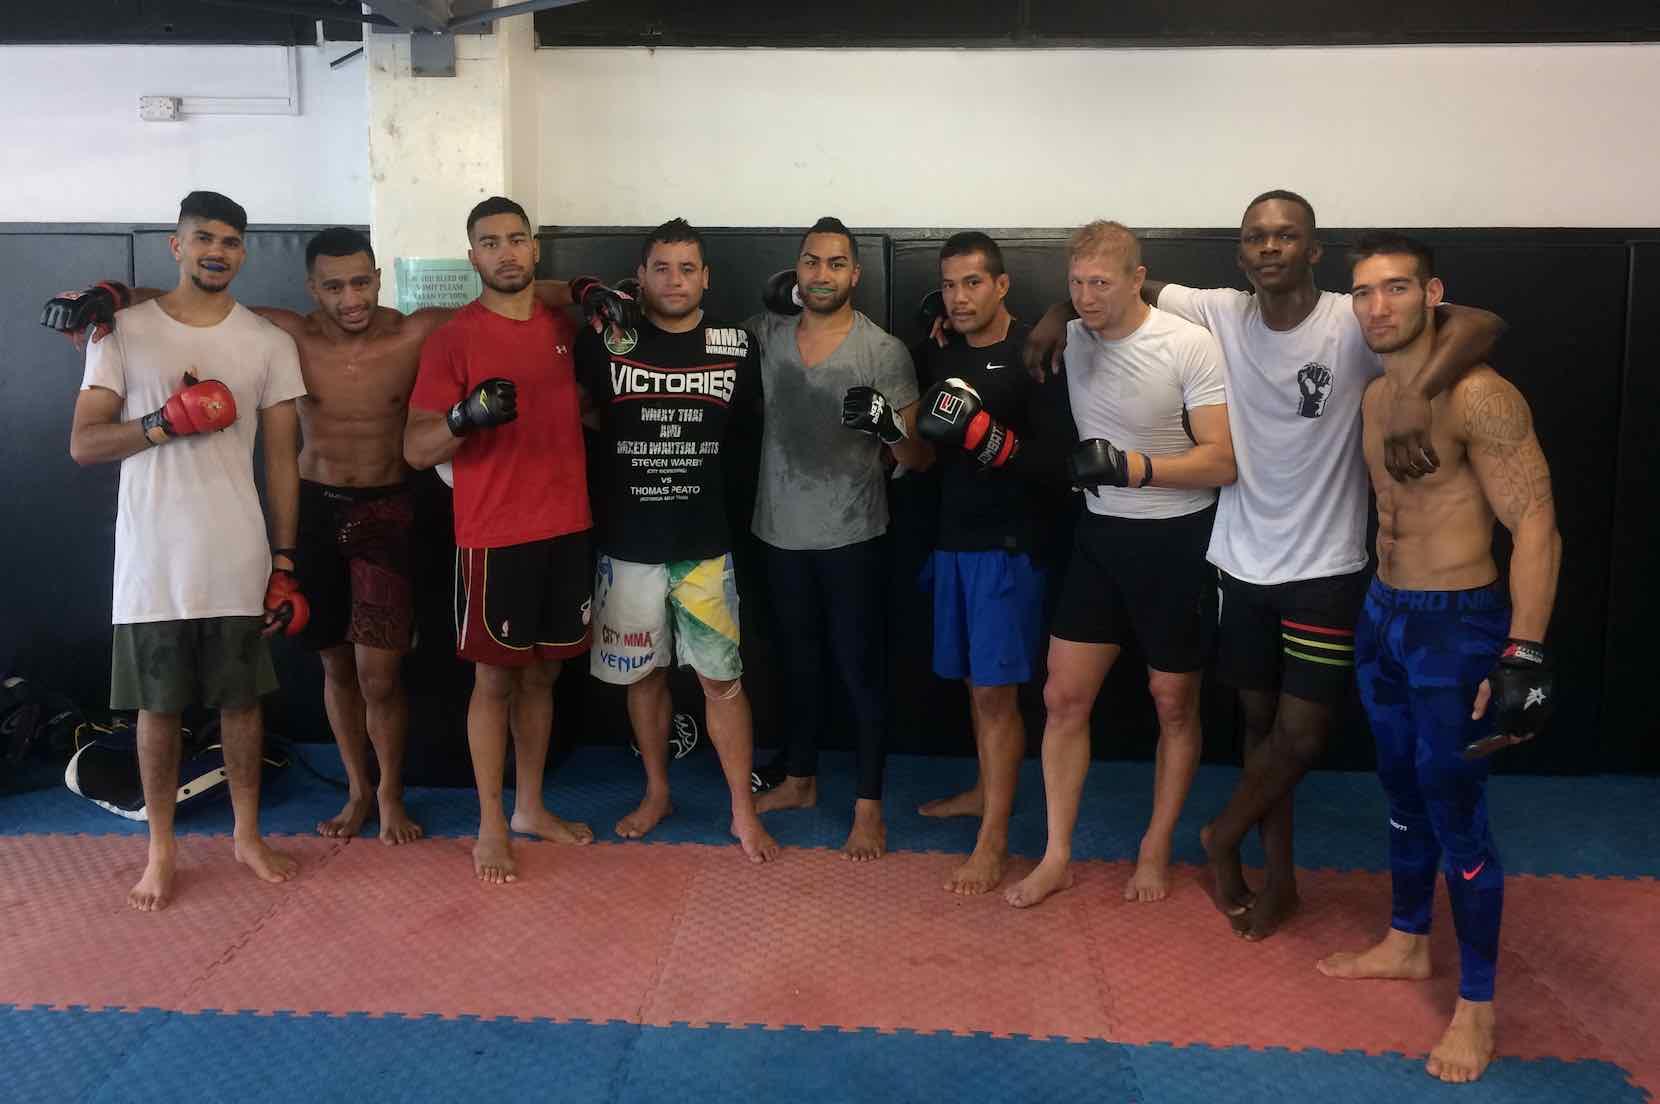 City Kickboxing lost Tongan Fau Vake to a coward's punch earlier this year